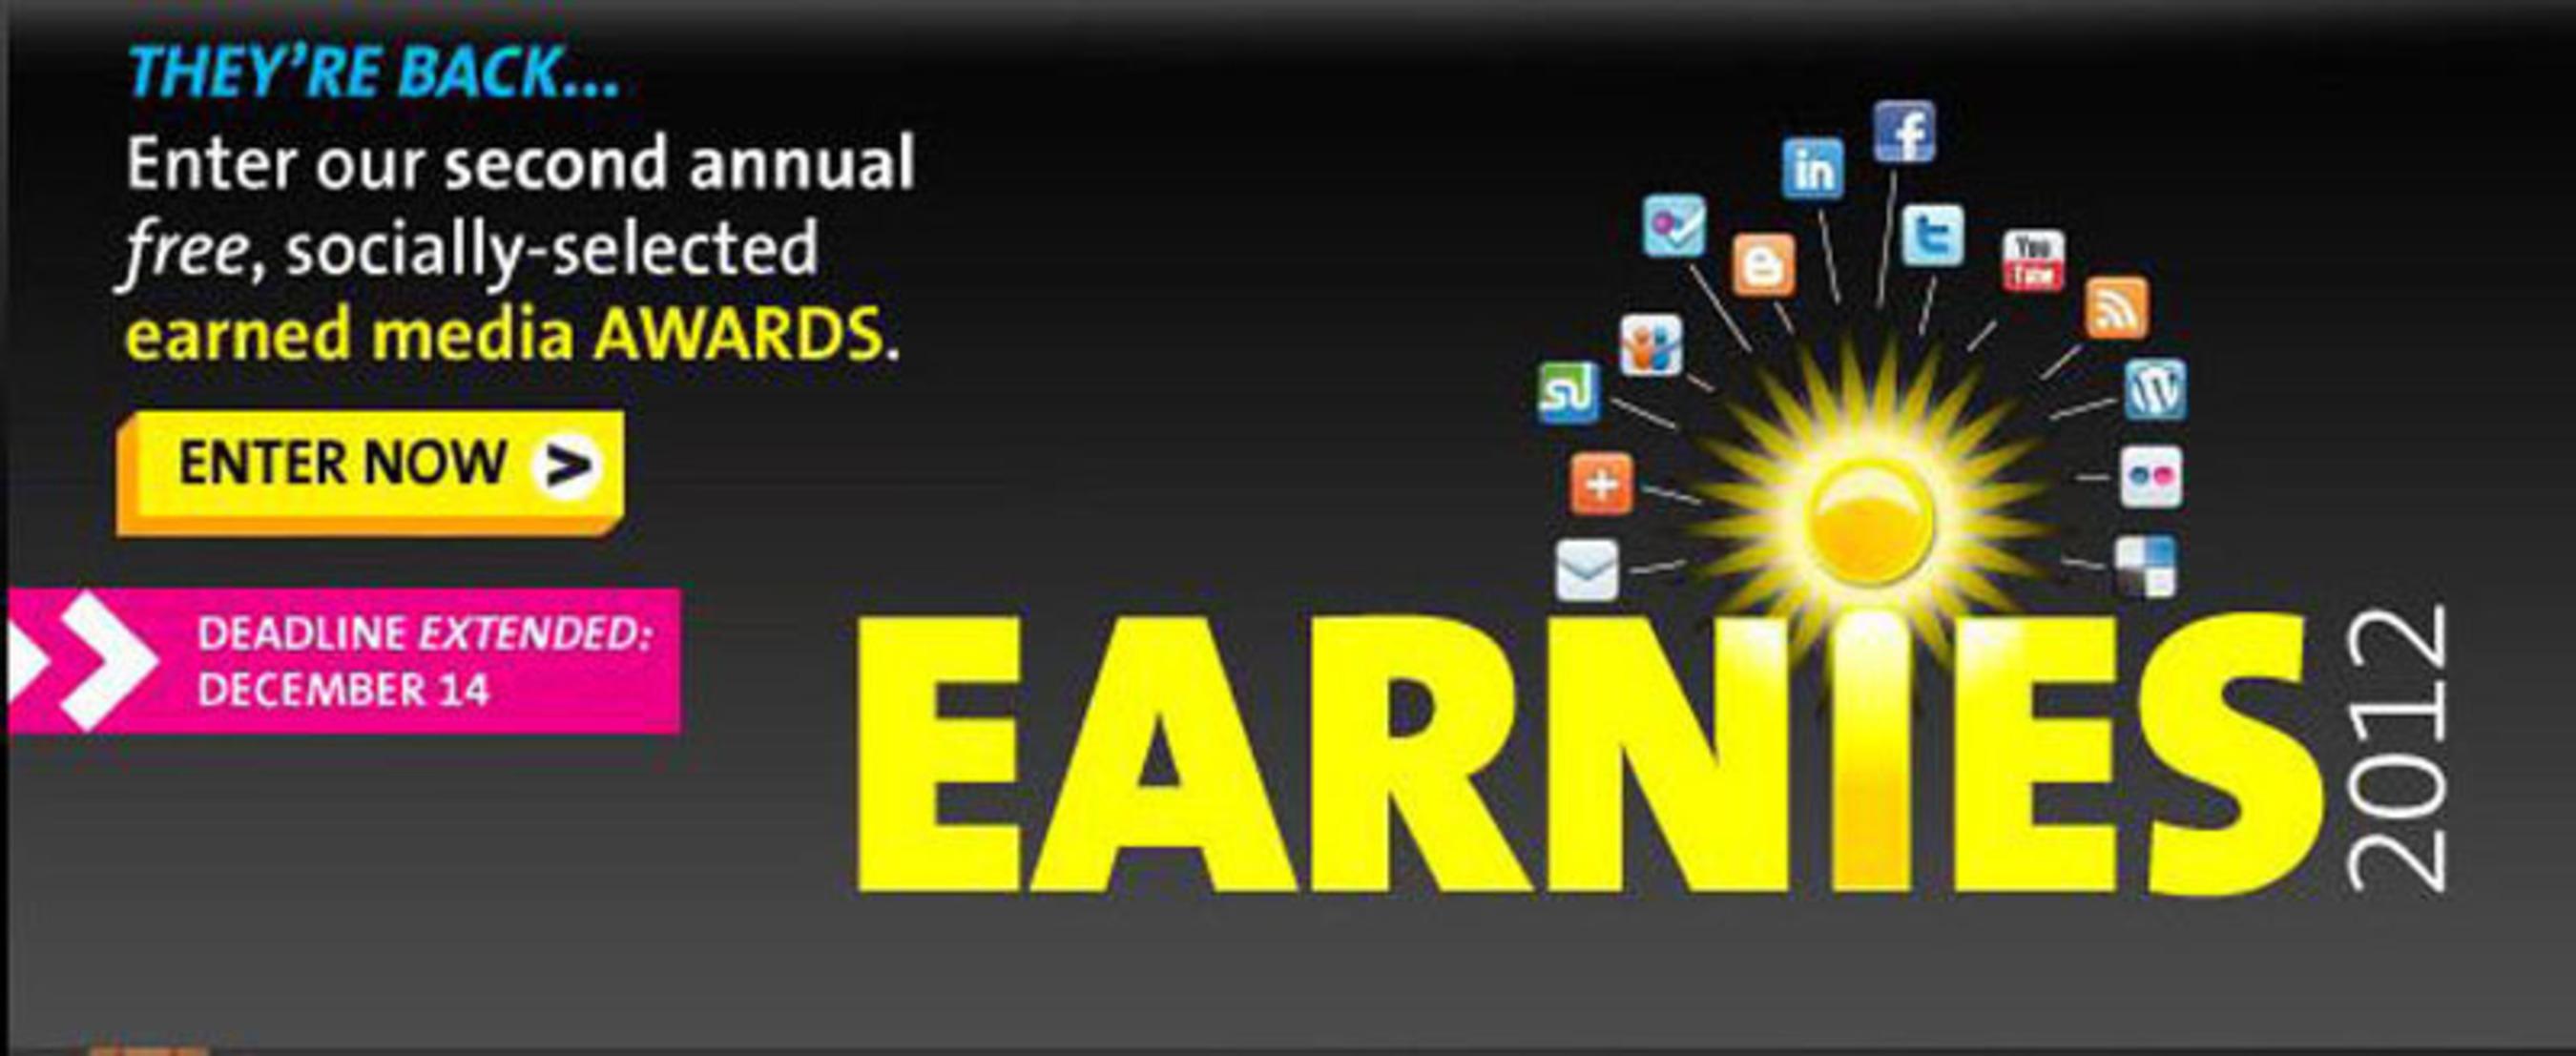 Showcase your earned media success and enter PR Newswire's Earnies awards program.  Deadline is Friday, December 14th, 2012. Visit www.agilitycommunity.com.  (PRNewsFoto/PR Newswire Association LLC)